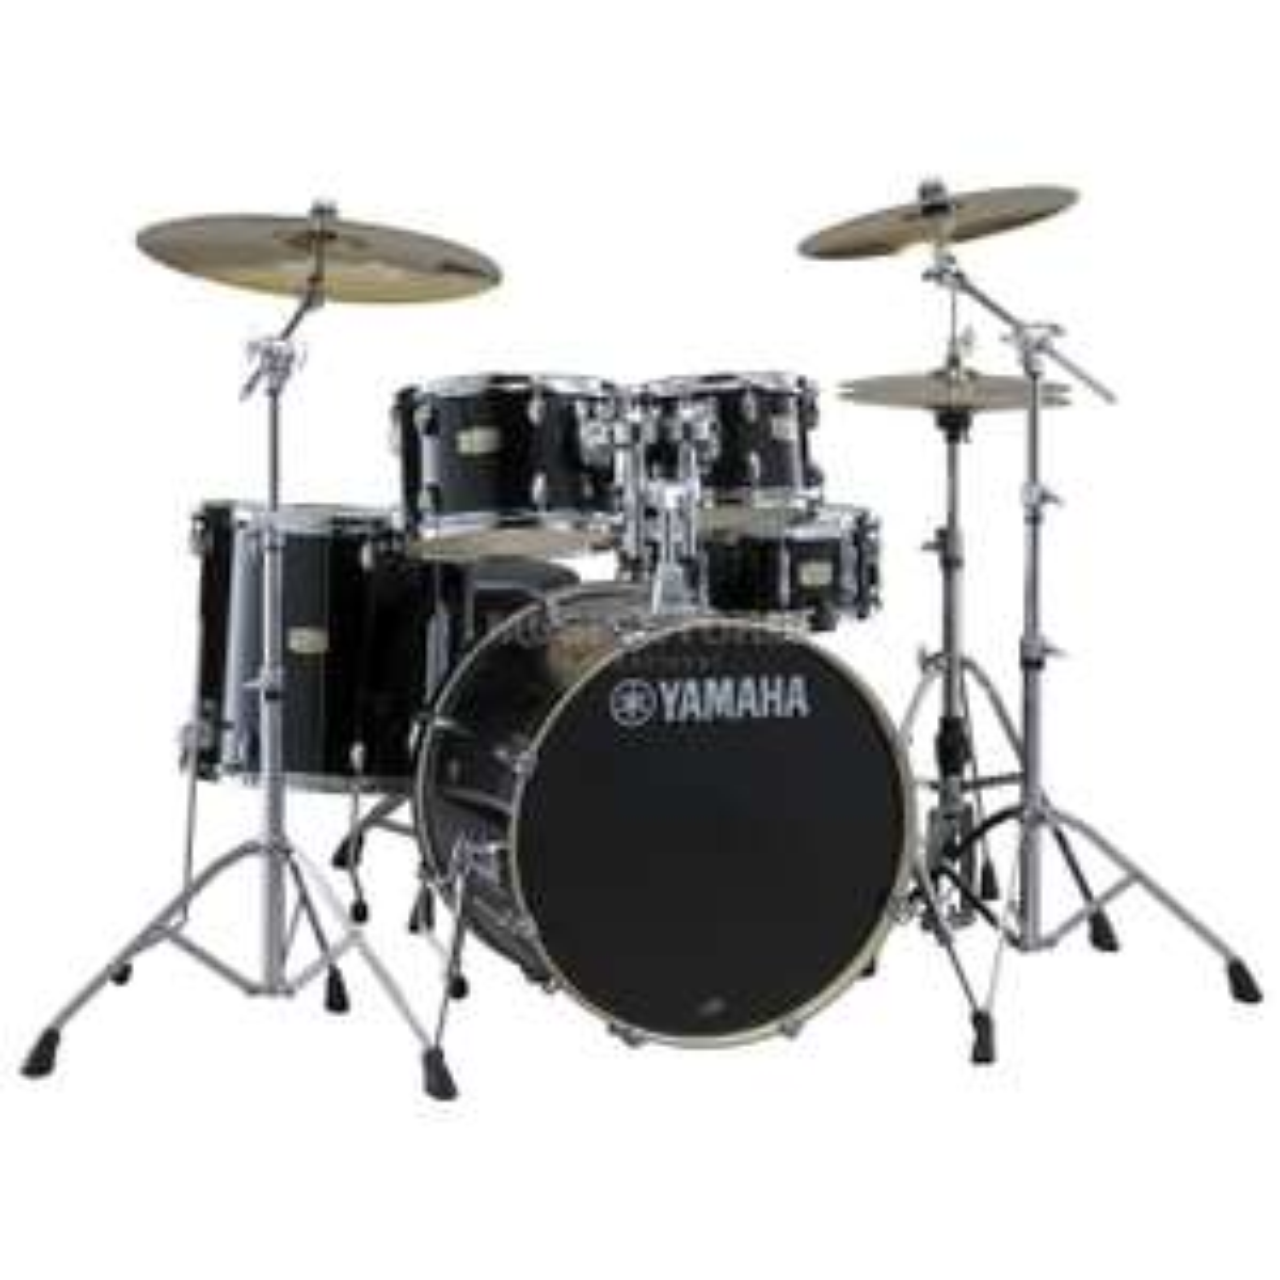 Yamaha Stage Custom Birch SBP0F5 Drum Set, Raven Black £588 delivered @ DV247 Music Store